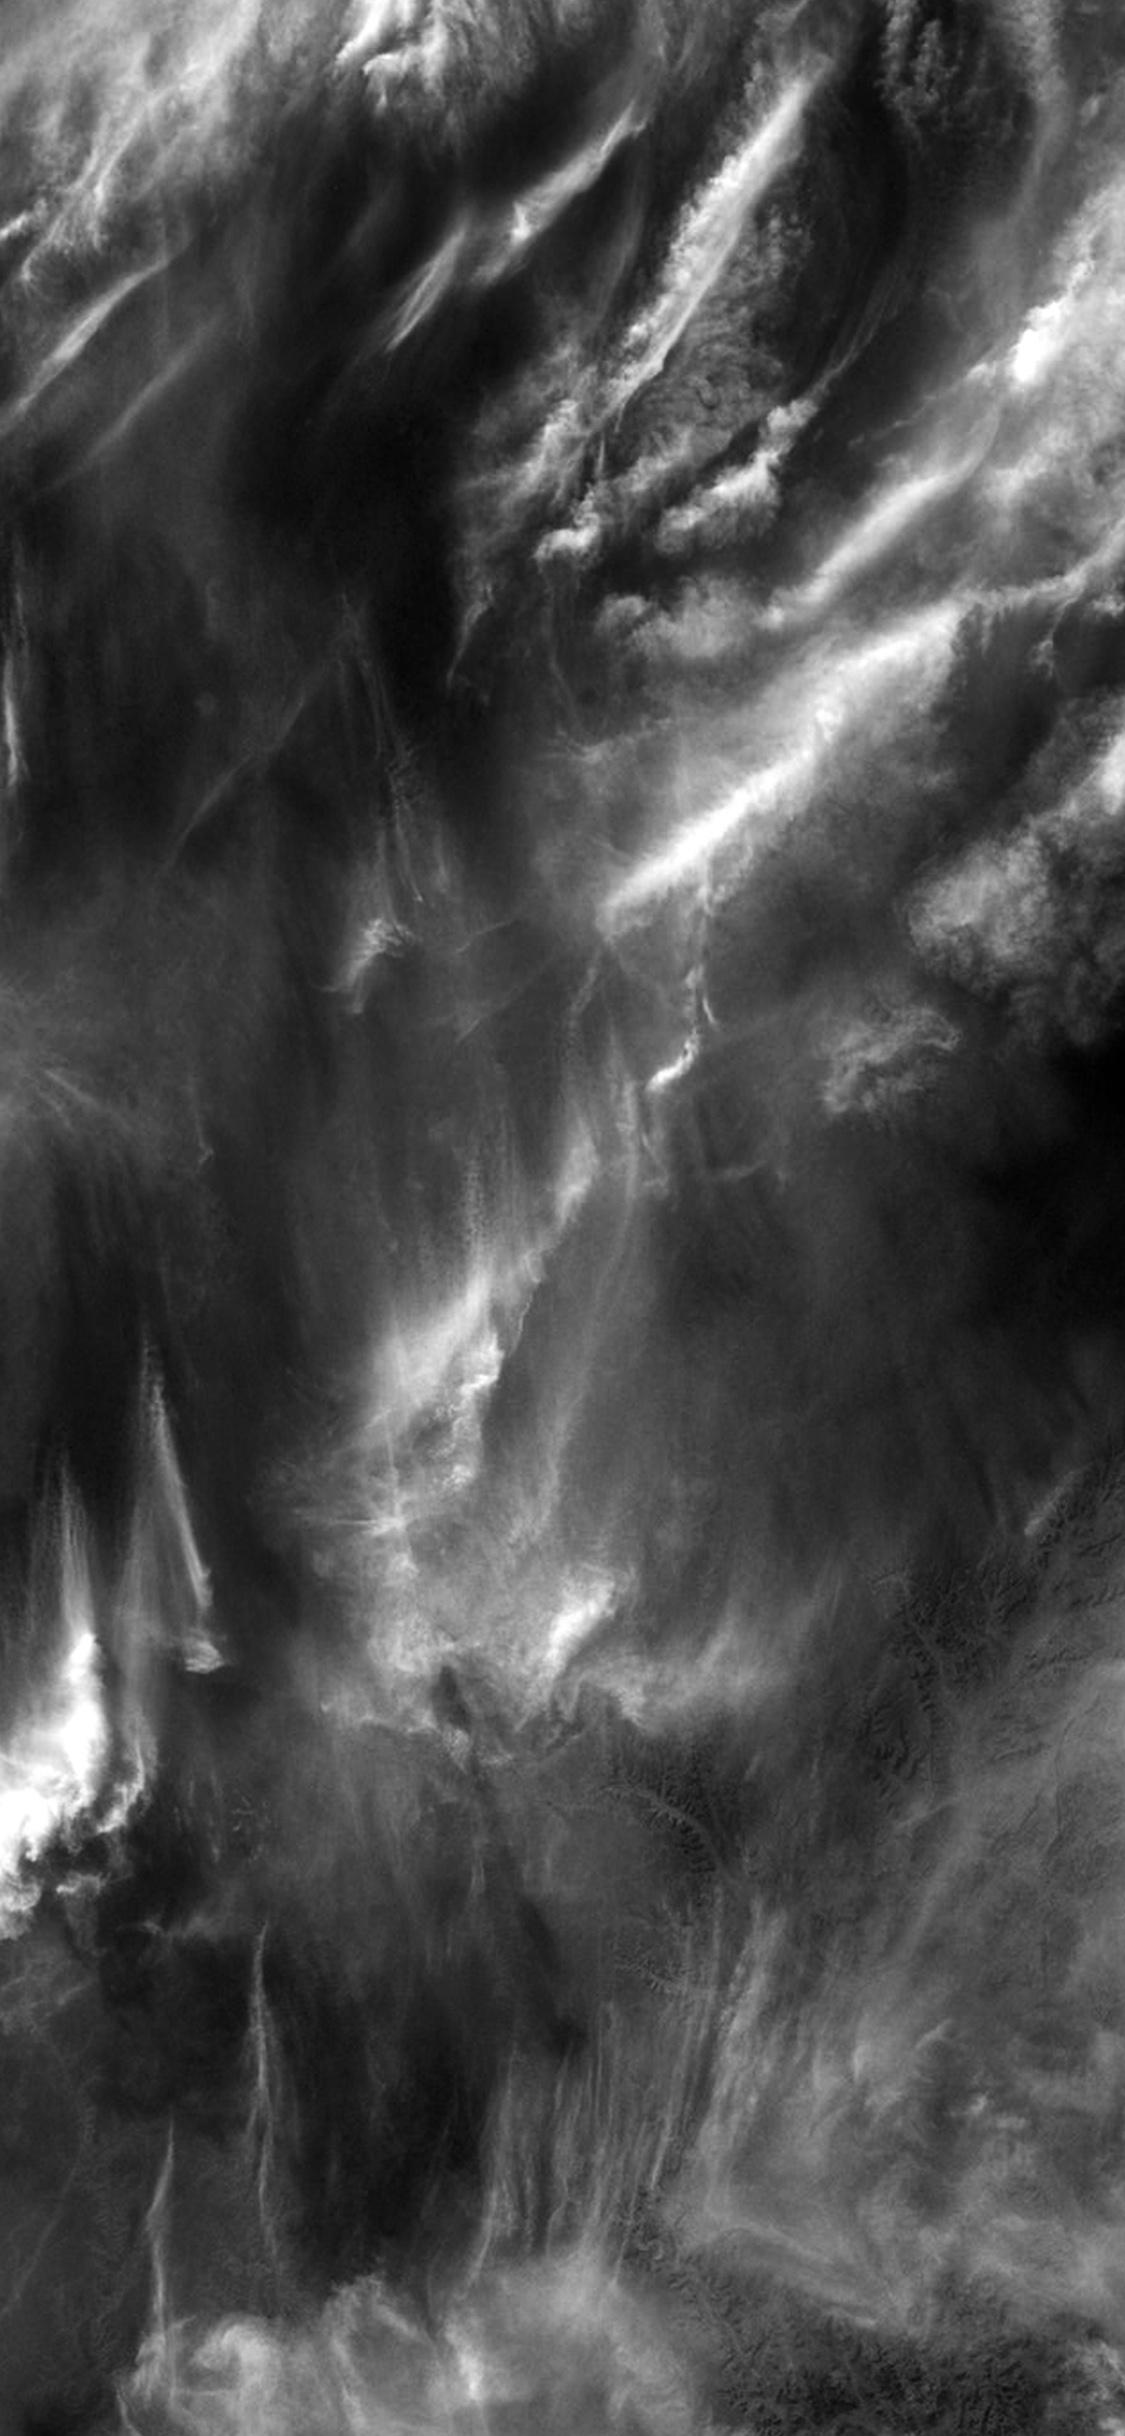 iPhonexpapers.com-Apple-iPhone-wallpaper-nj17-skyview-earth-earthview-cloud-mountain-nature-bw-dark